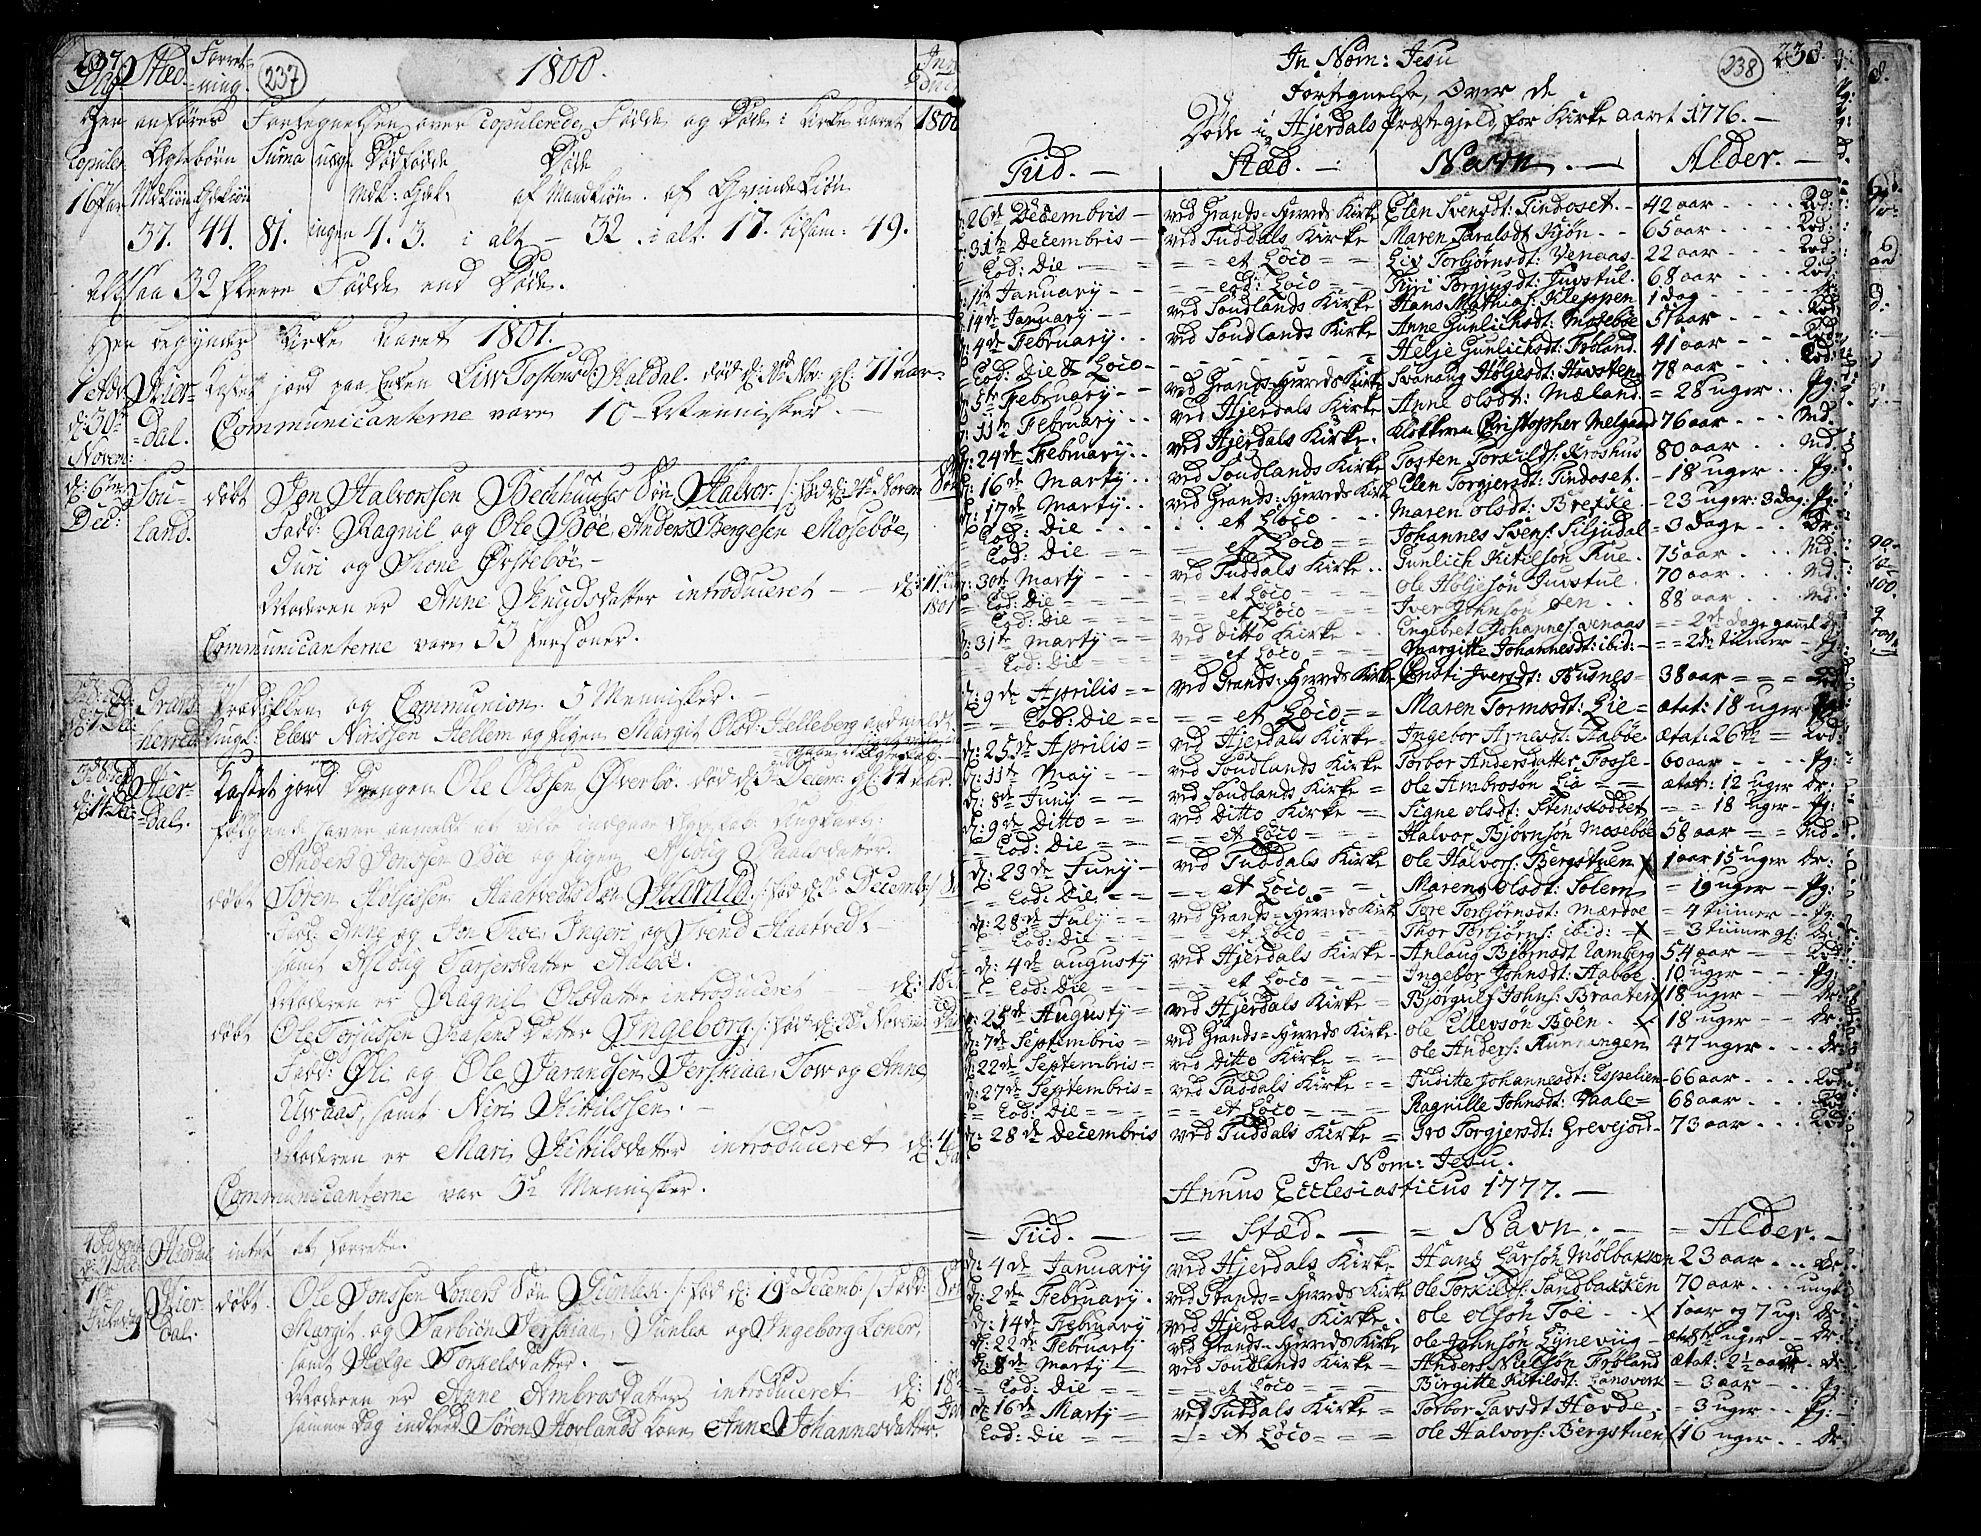 SAKO, Hjartdal kirkebøker, F/Fa/L0005: Ministerialbok nr. I 5, 1776-1801, s. 237-238